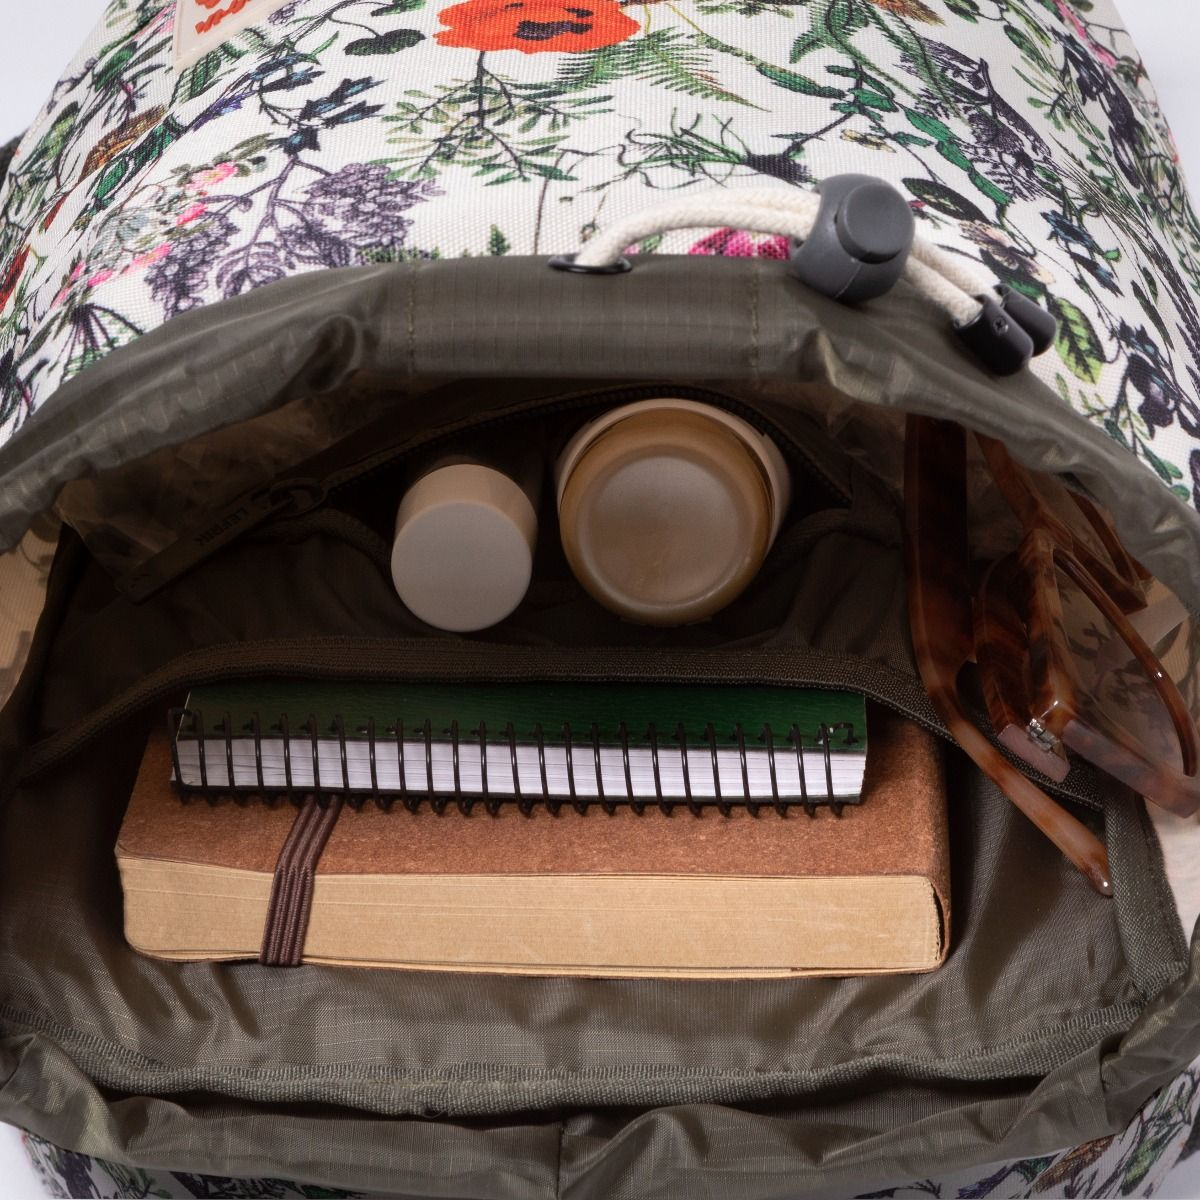 Lefrik Scout Mini Rucksack in Botanical